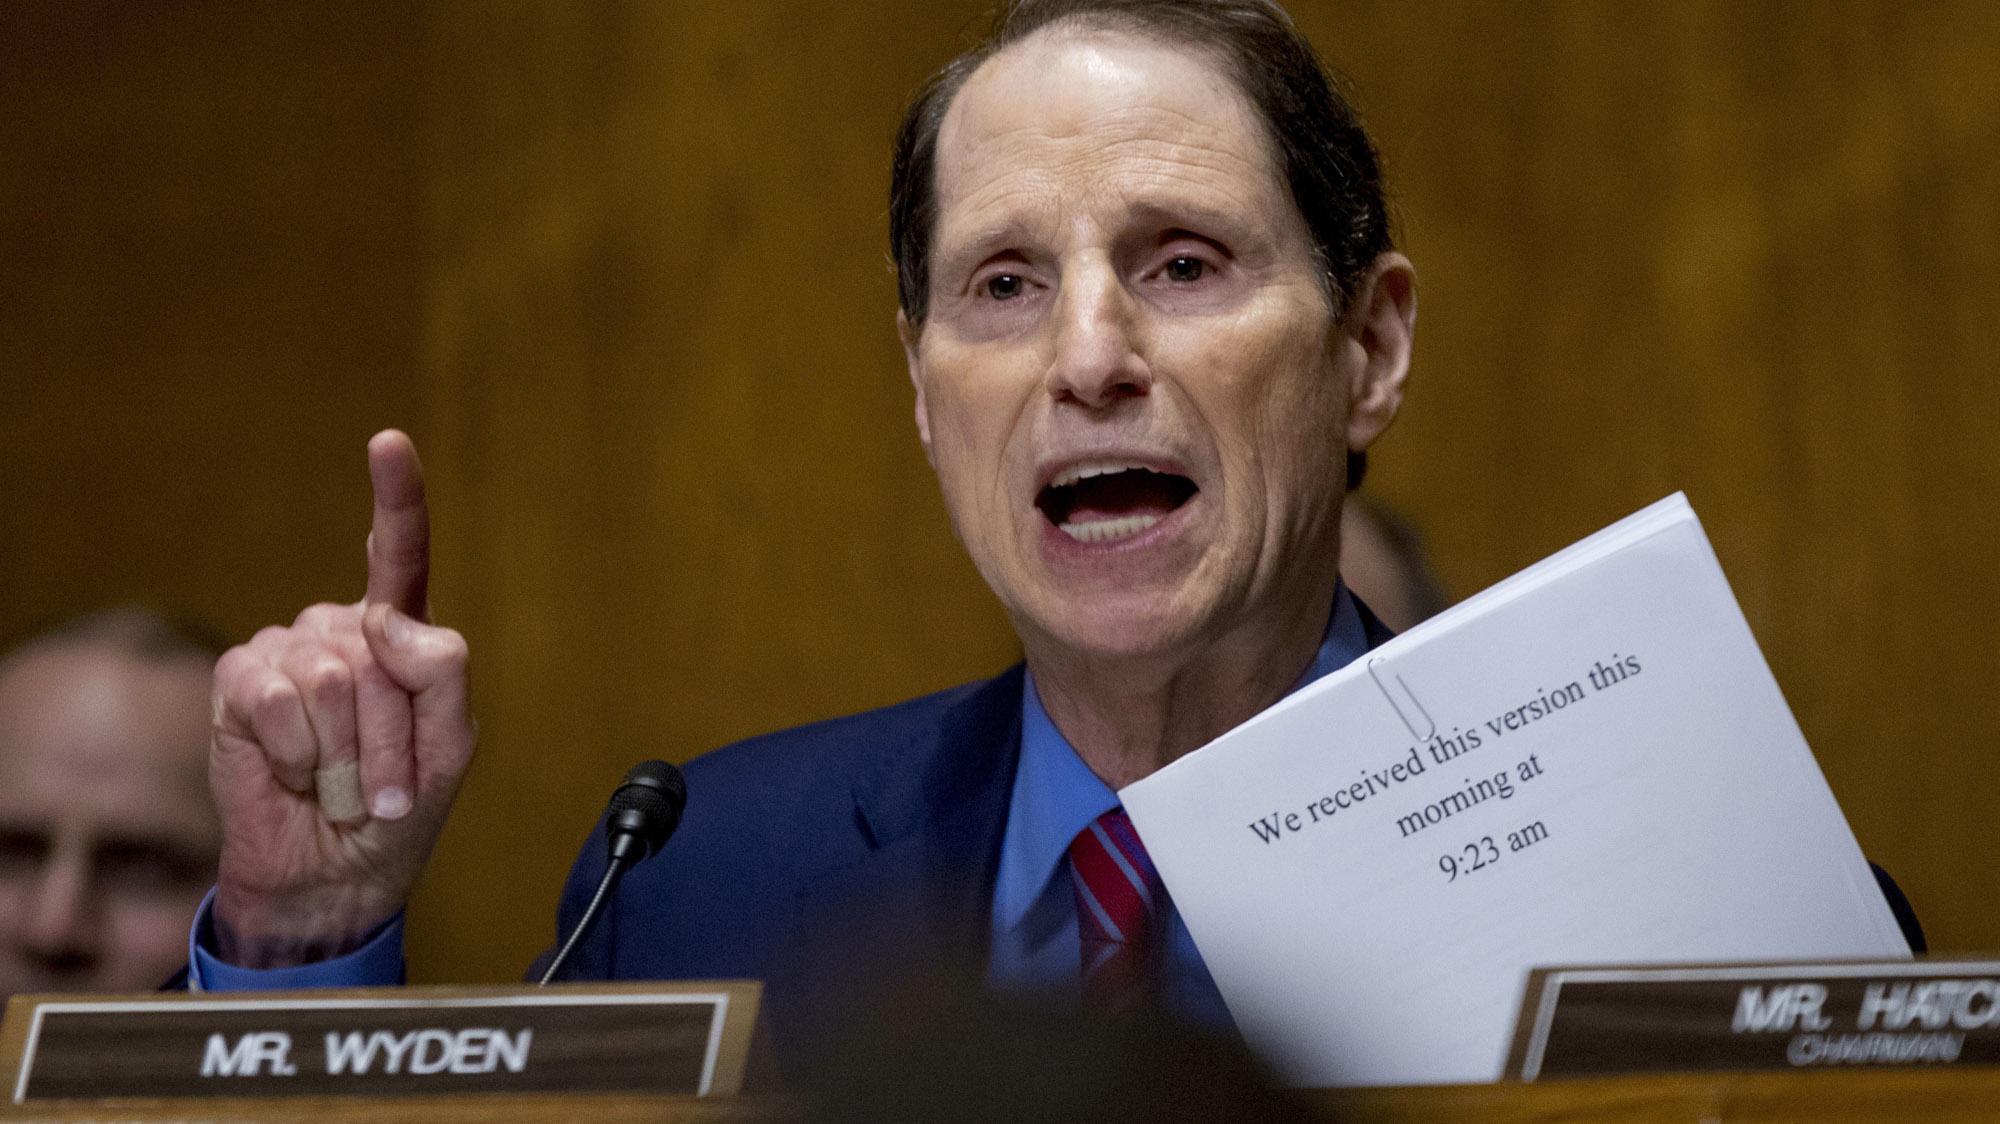 Trump Suggests Senate Intel Committee Investigate 'Fake News'